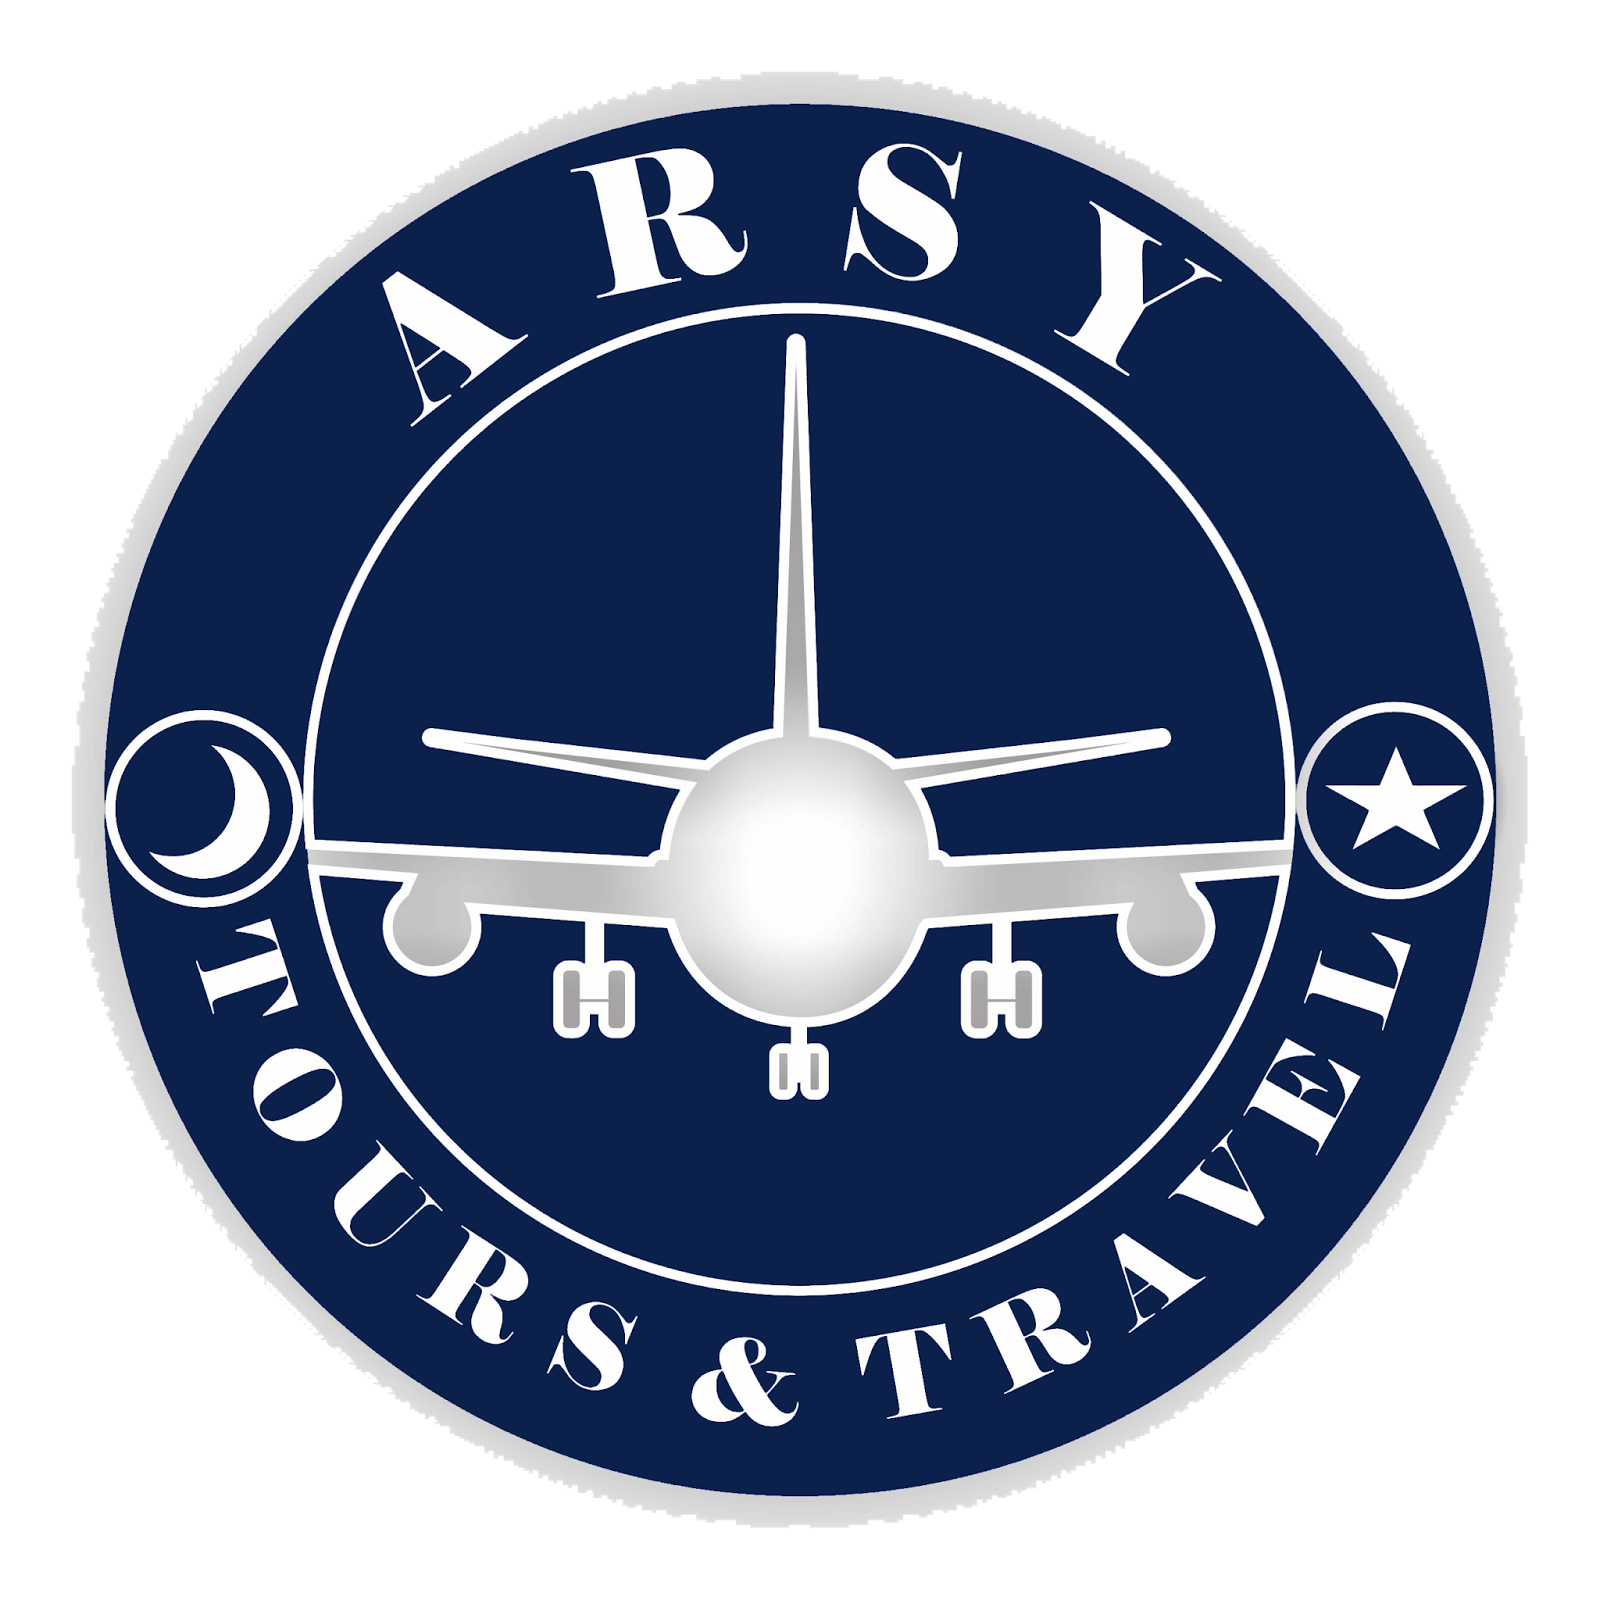 Arsy Tours & Travel